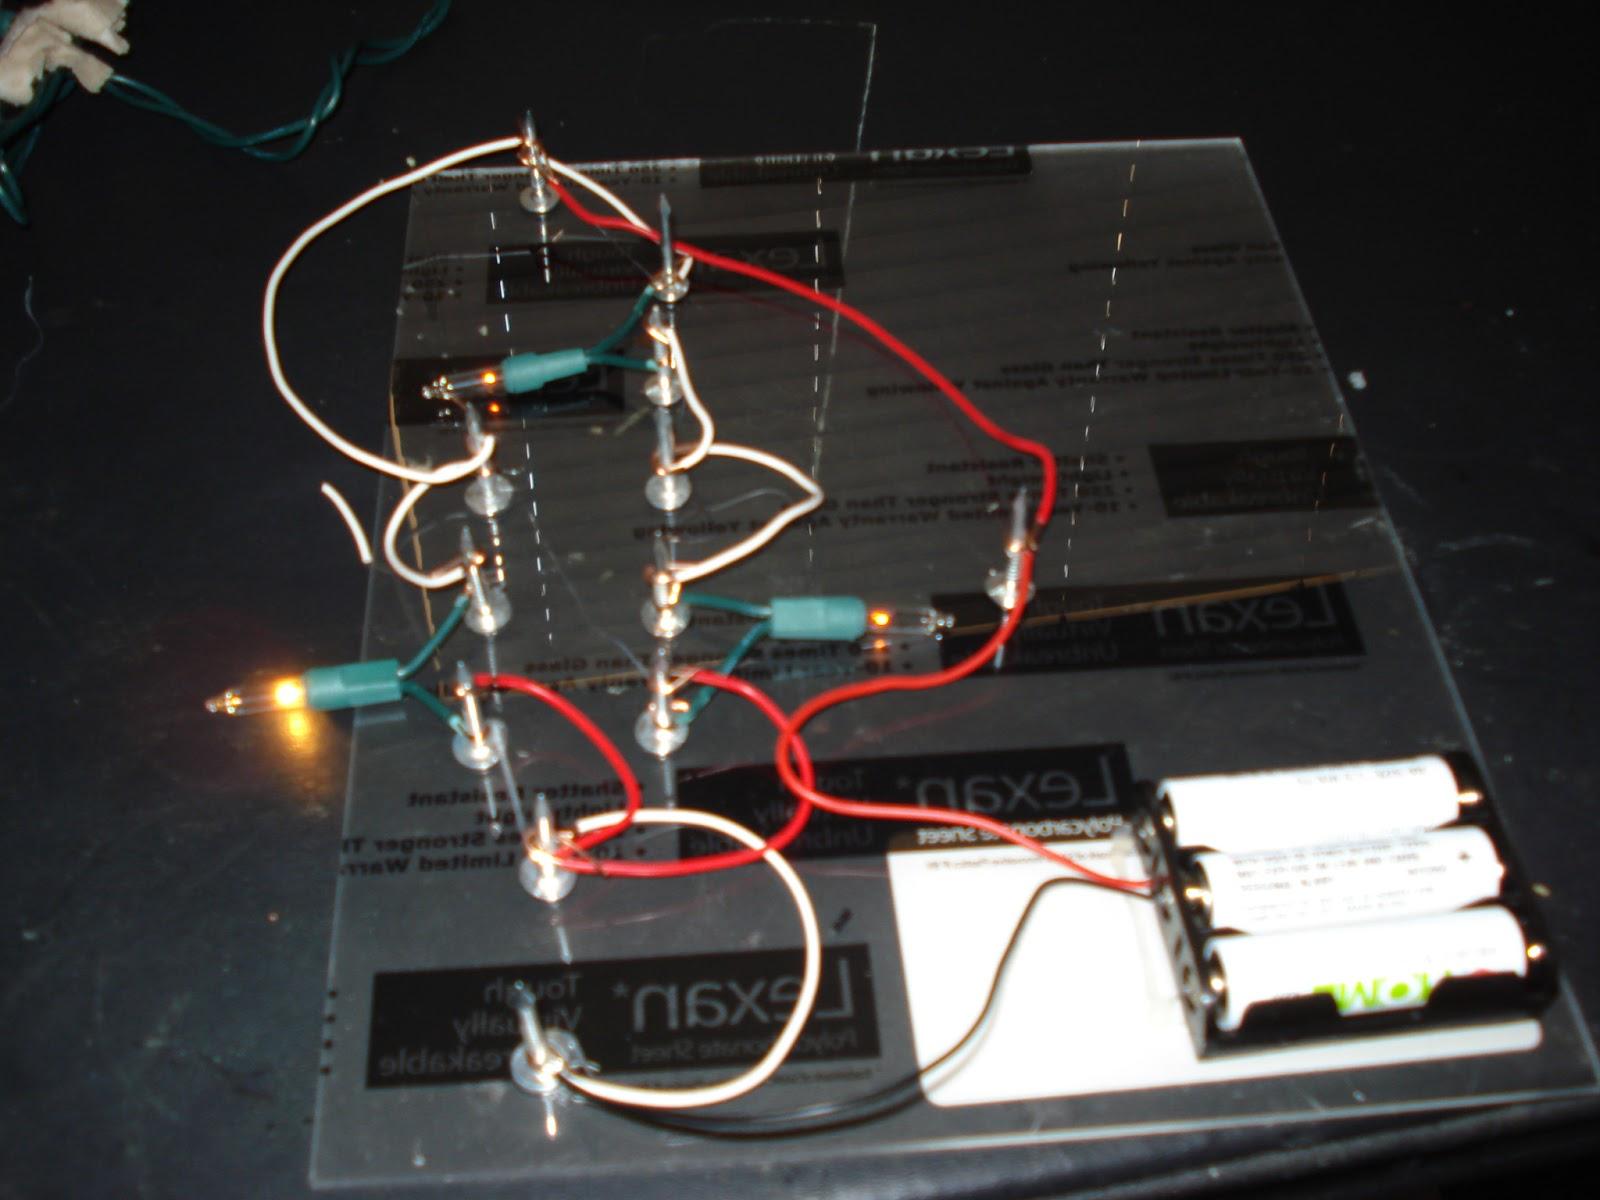 DIY Physics Circuit Boards | Brinn Belyea Science